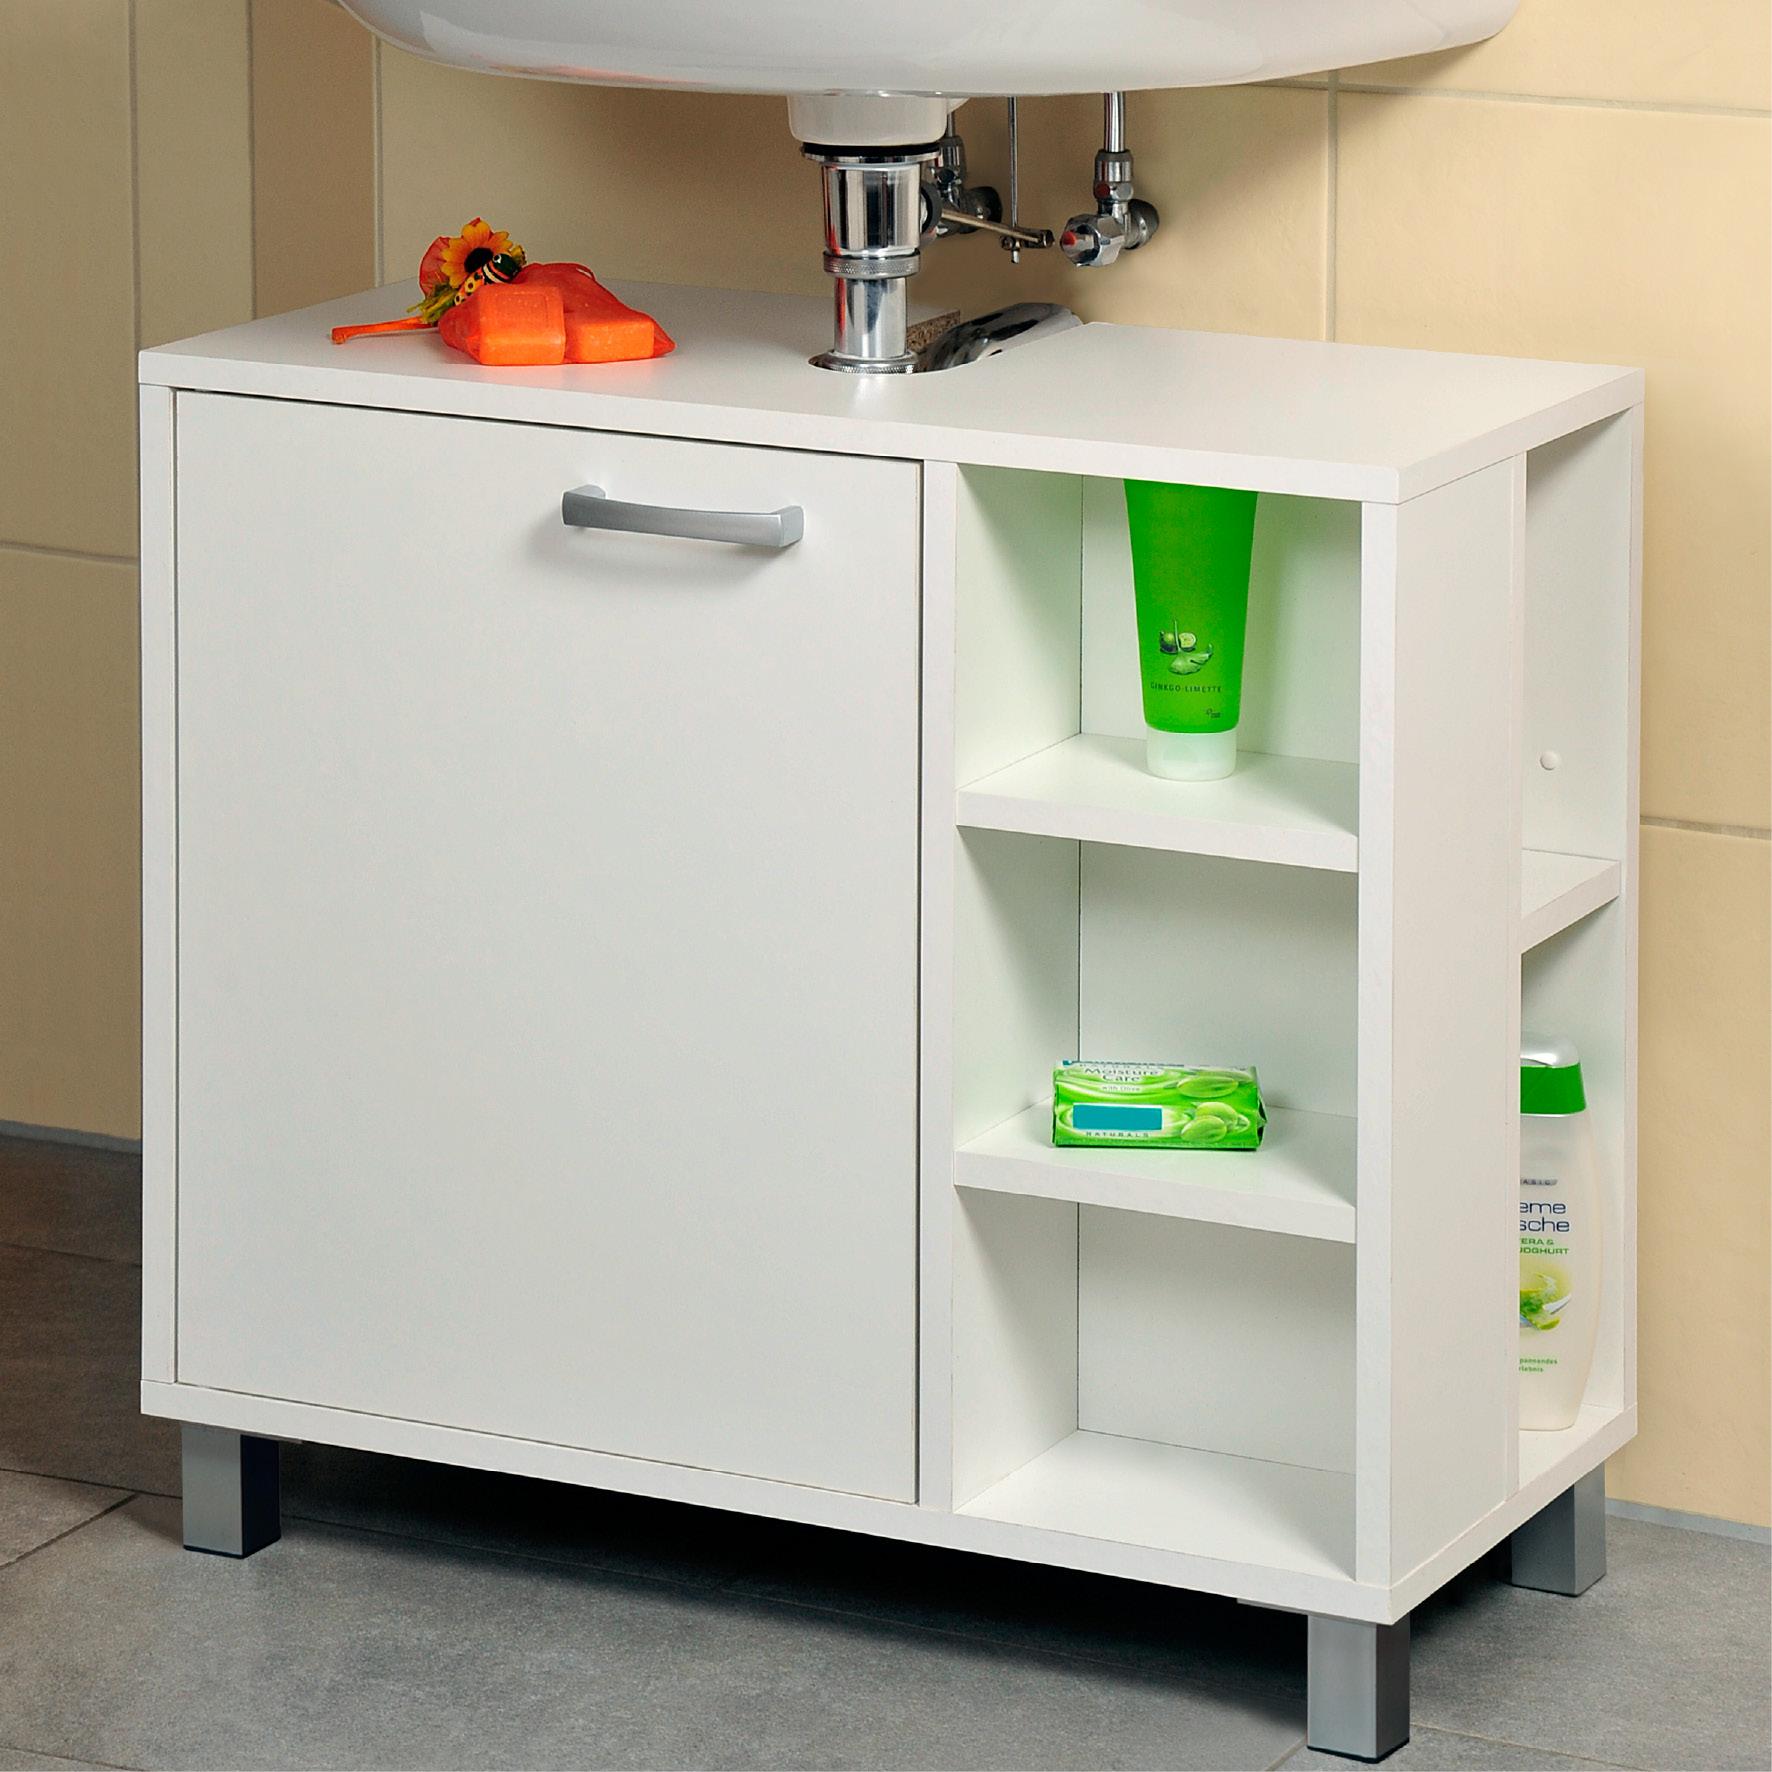 Koupelnov Dopl Ky Sk Ky Pod Umyvadlo Kesper Sk Ka Pod Umyvadlo B L 89200 Etc Shop